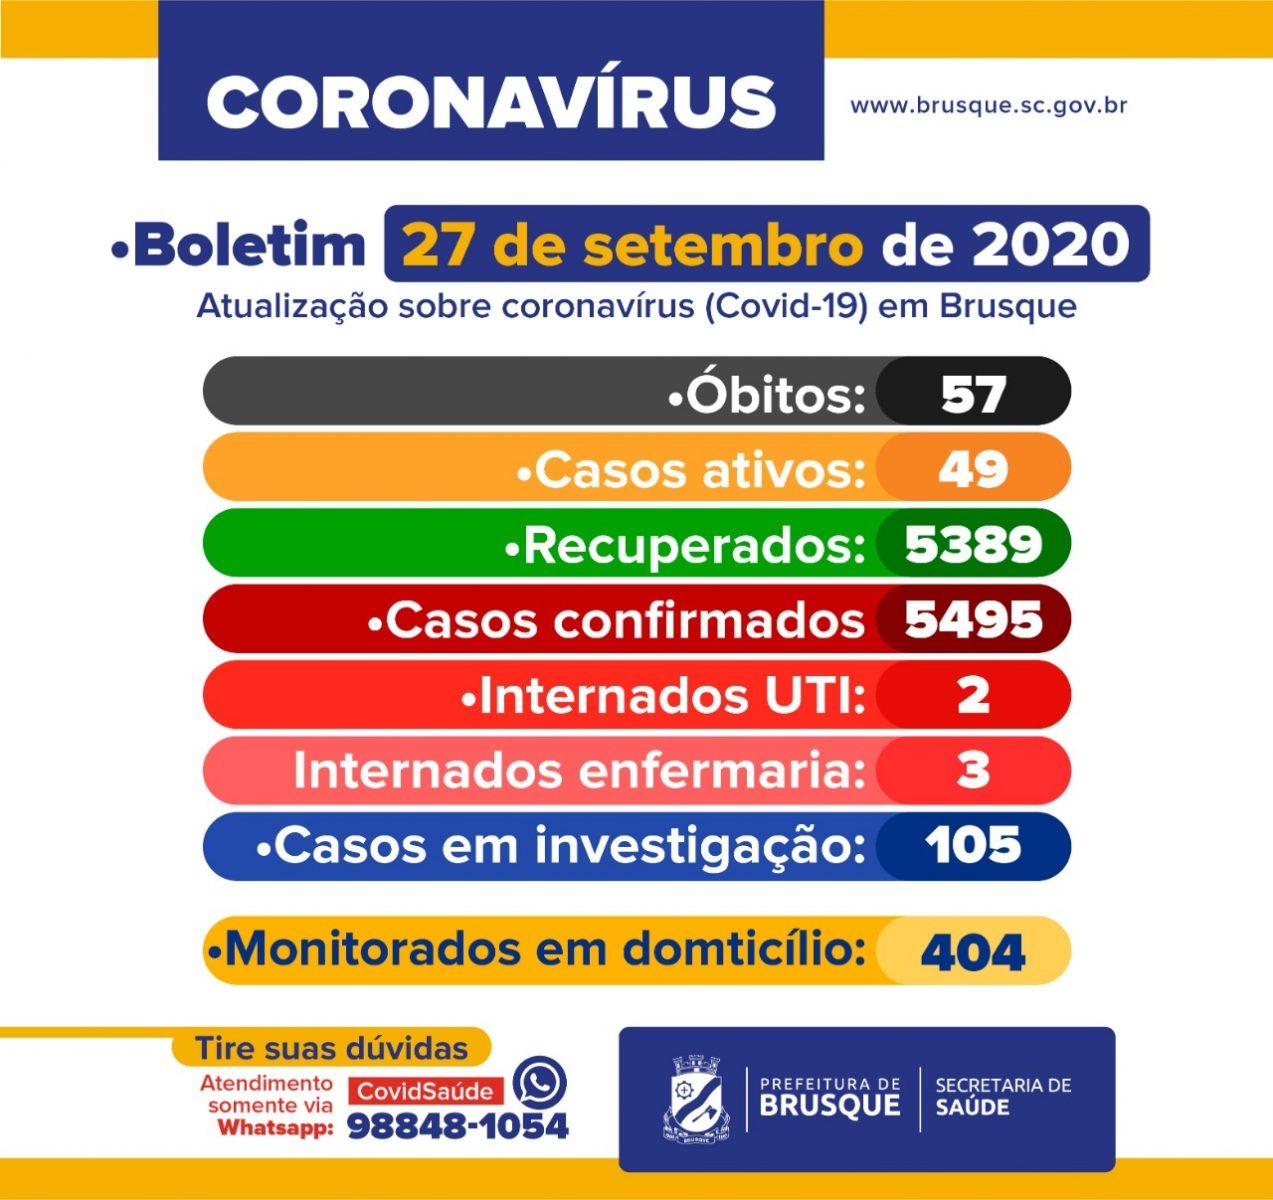 COVID-19: Boletim epidemiológico 27 de setembro